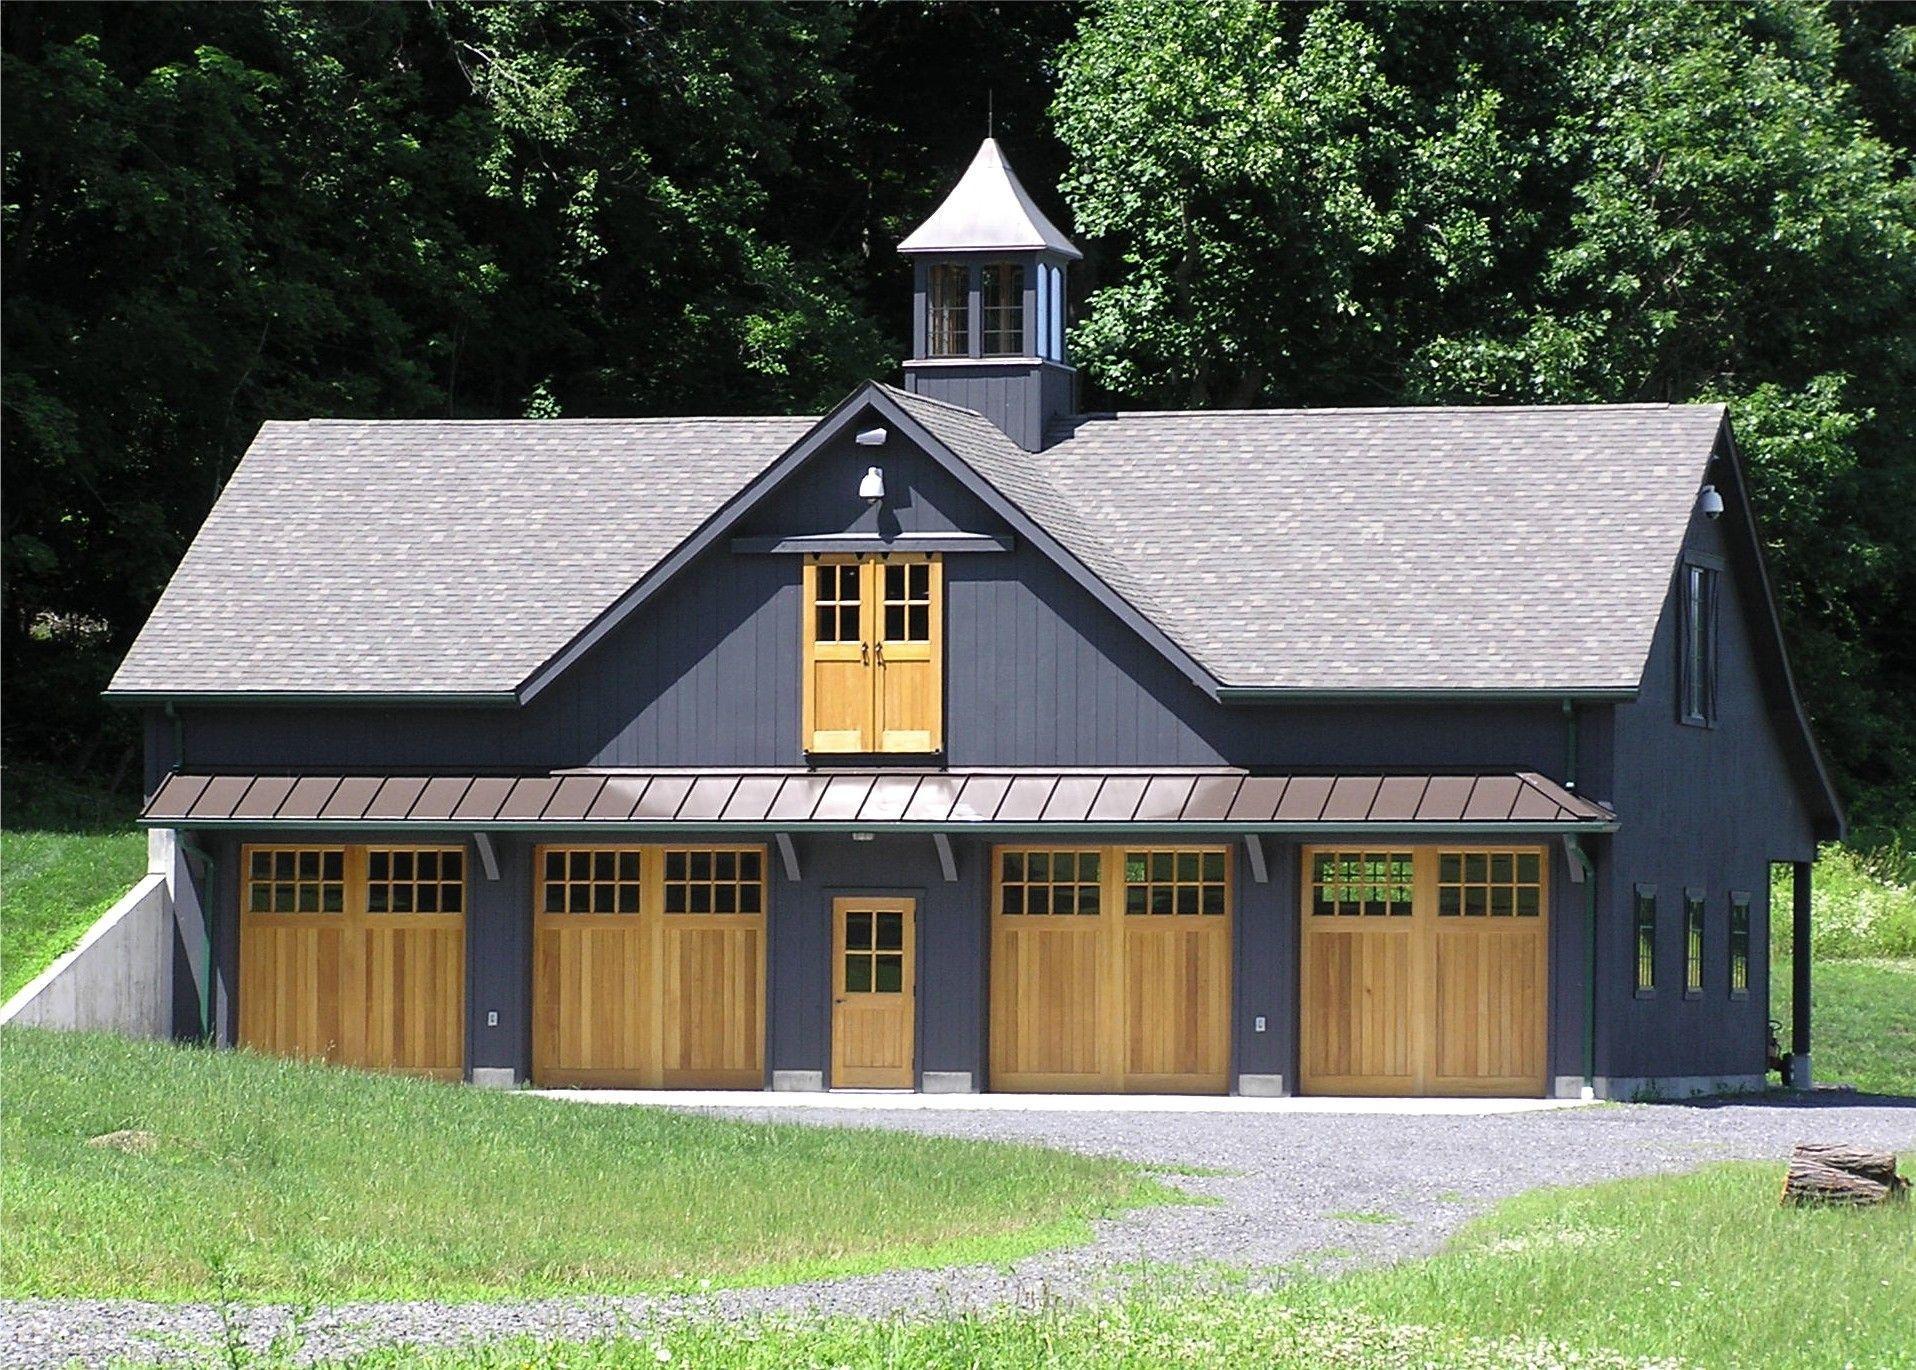 40 Best Detached Garage Model For Your Wonderful House Carriage House Plans Garage Apartment Plans Garage Door Design